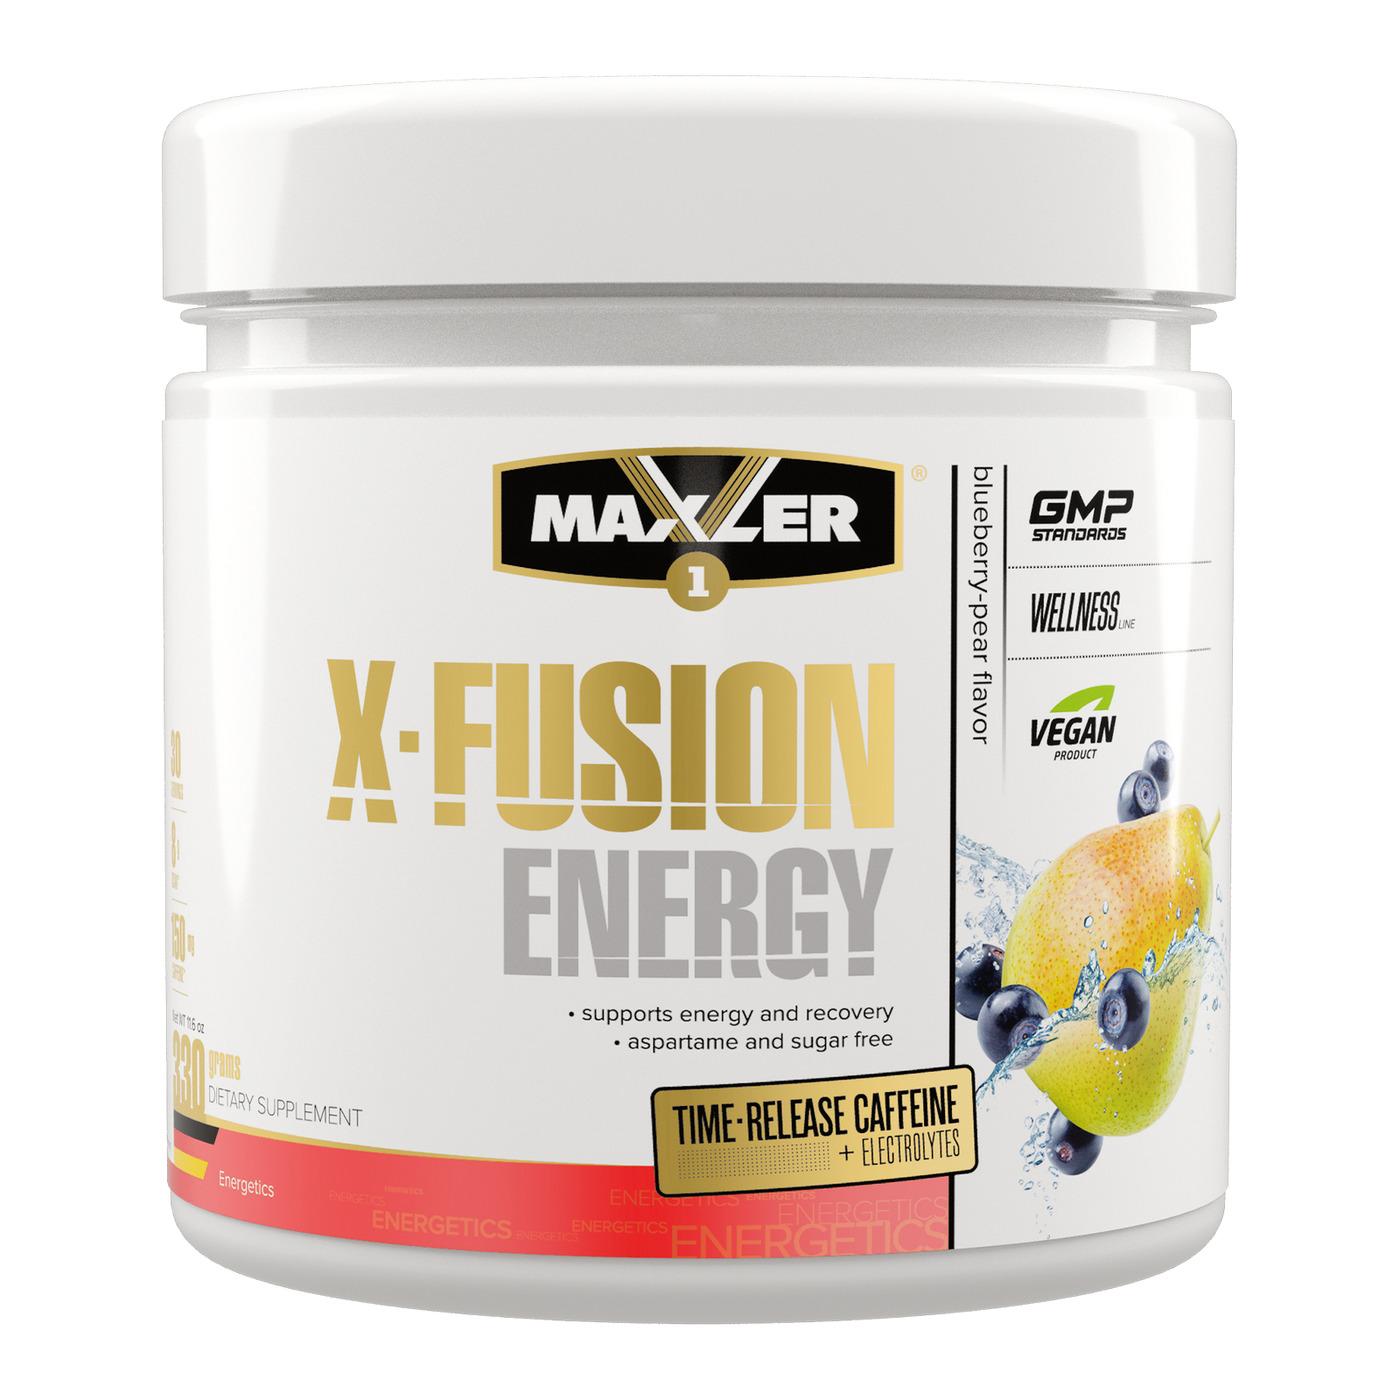 Энергетик и восстановитель с электролитами Maxler X-Fusion Energy 330 гр. (BCAA, кофеин, цитруллин малат) - Черника-Груша